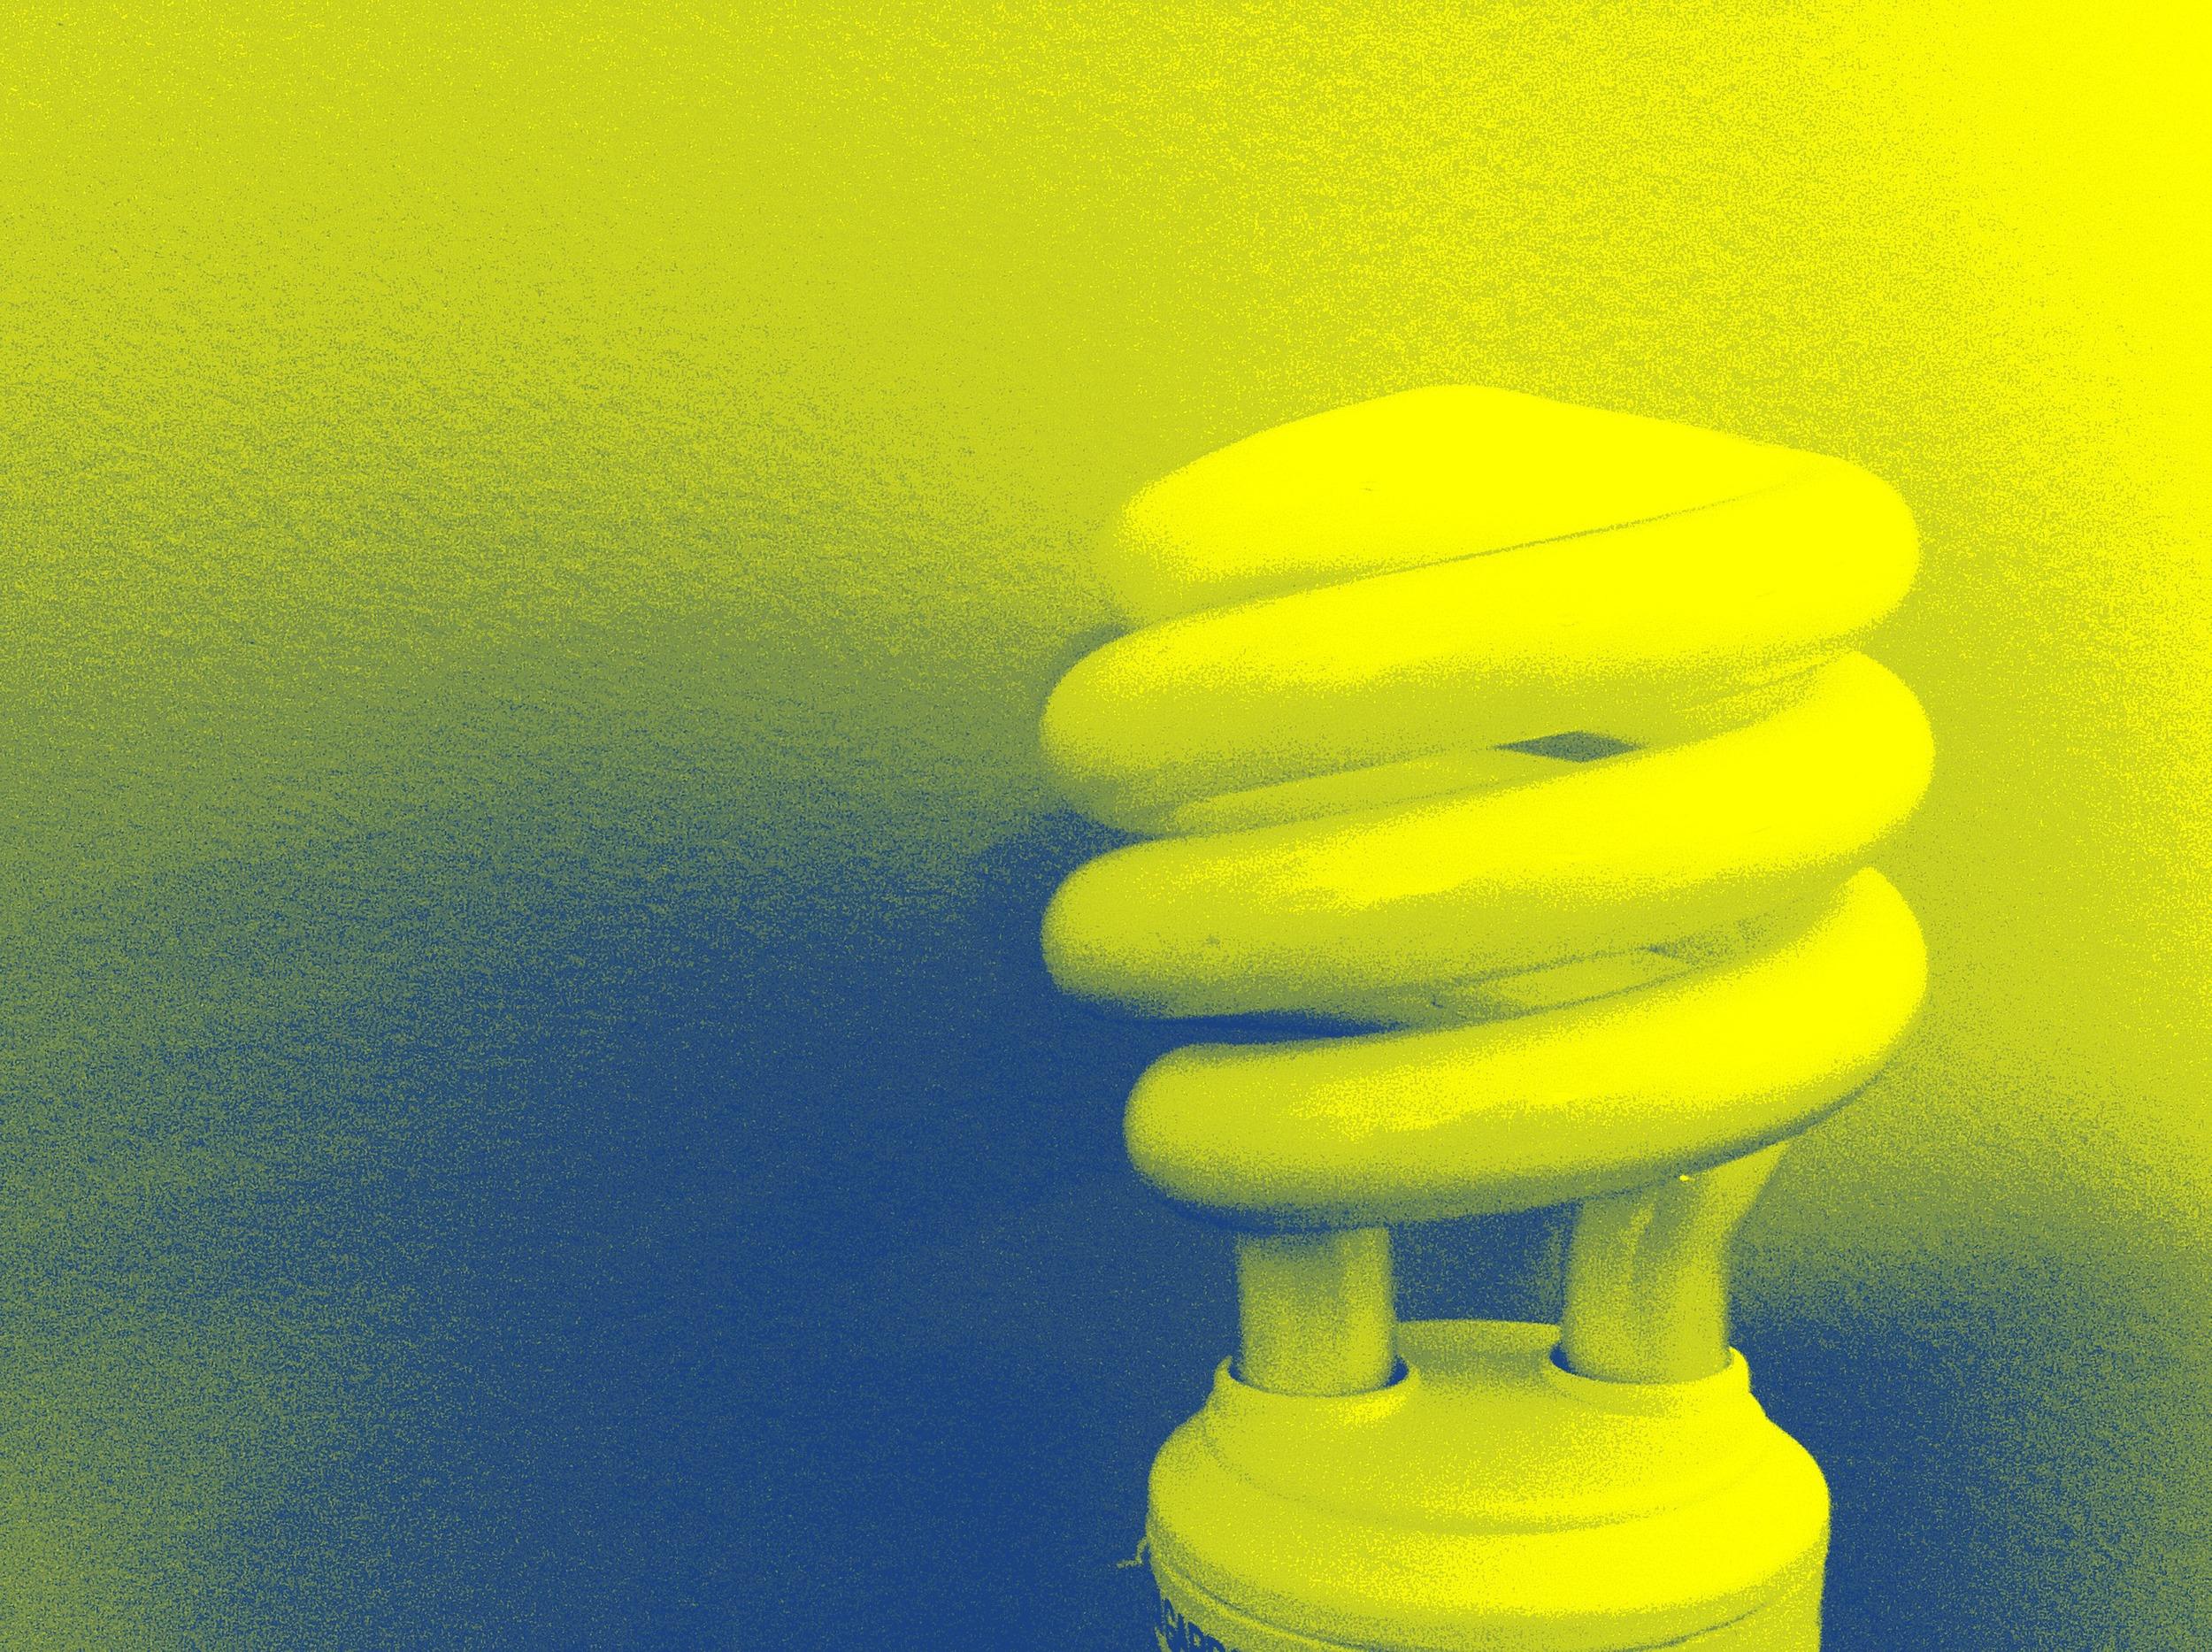 bl_light_bulb_blue_yellow.jpg